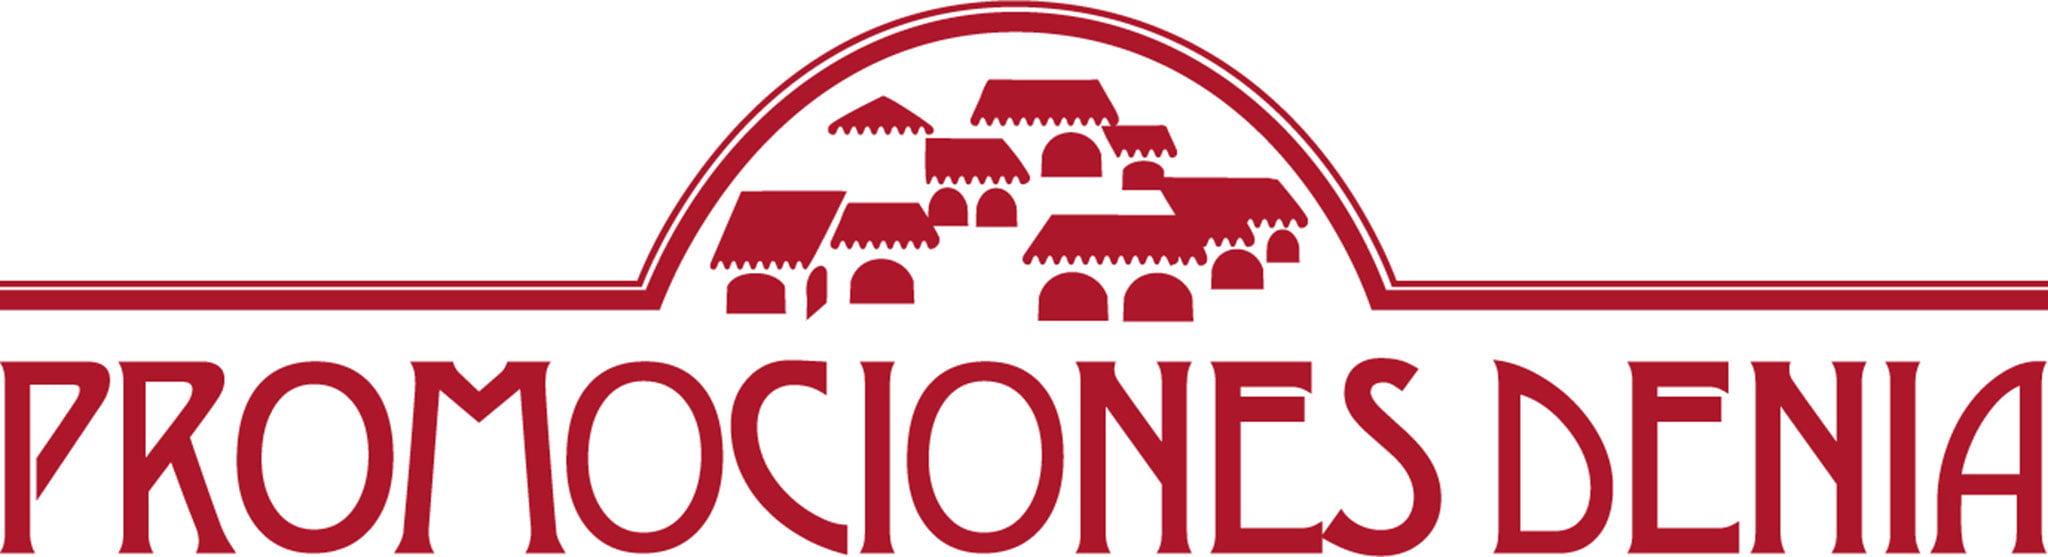 Logotipo de Promociones Denia, S.L.